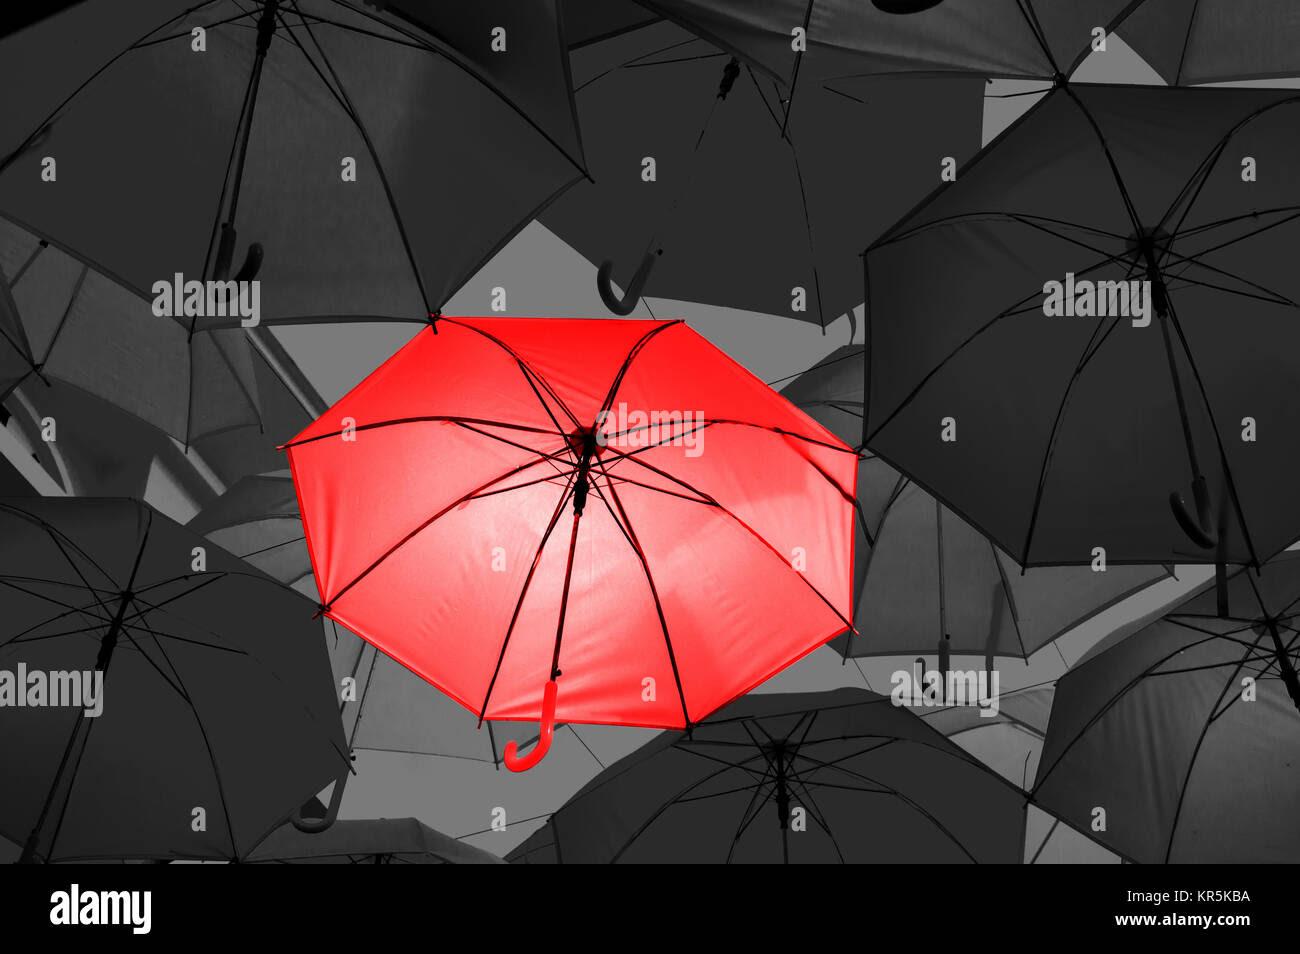 Red Umbrella In Black And White Umbrellas Stock Photo 169155374 Alamy